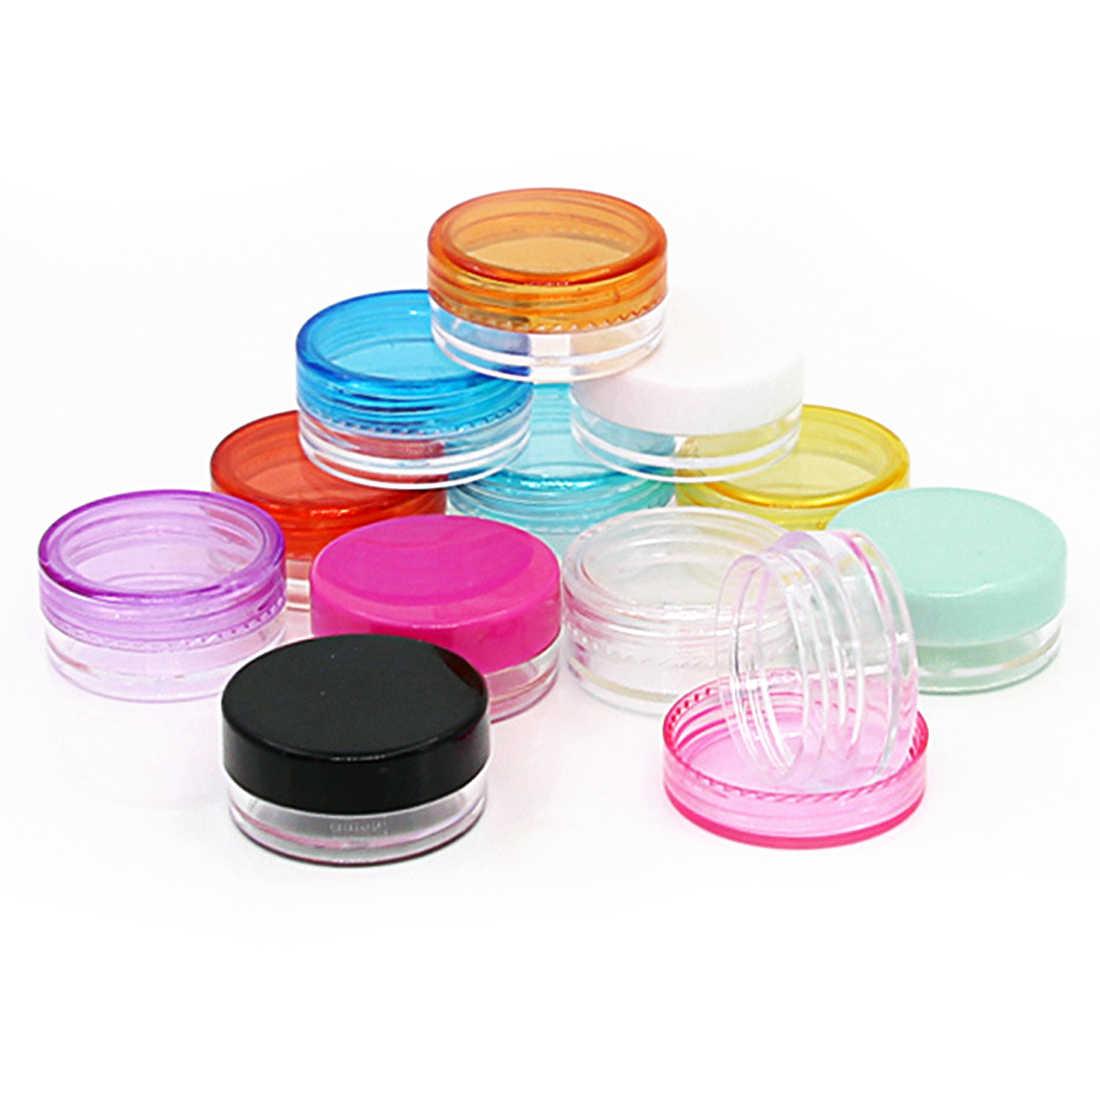 10pcs 5g Mini Refillable Bottles Cosmetic Empty Jar Acrylic Pot Eyeshadow Makeup Bottle Face Cream Box Round Container Storage